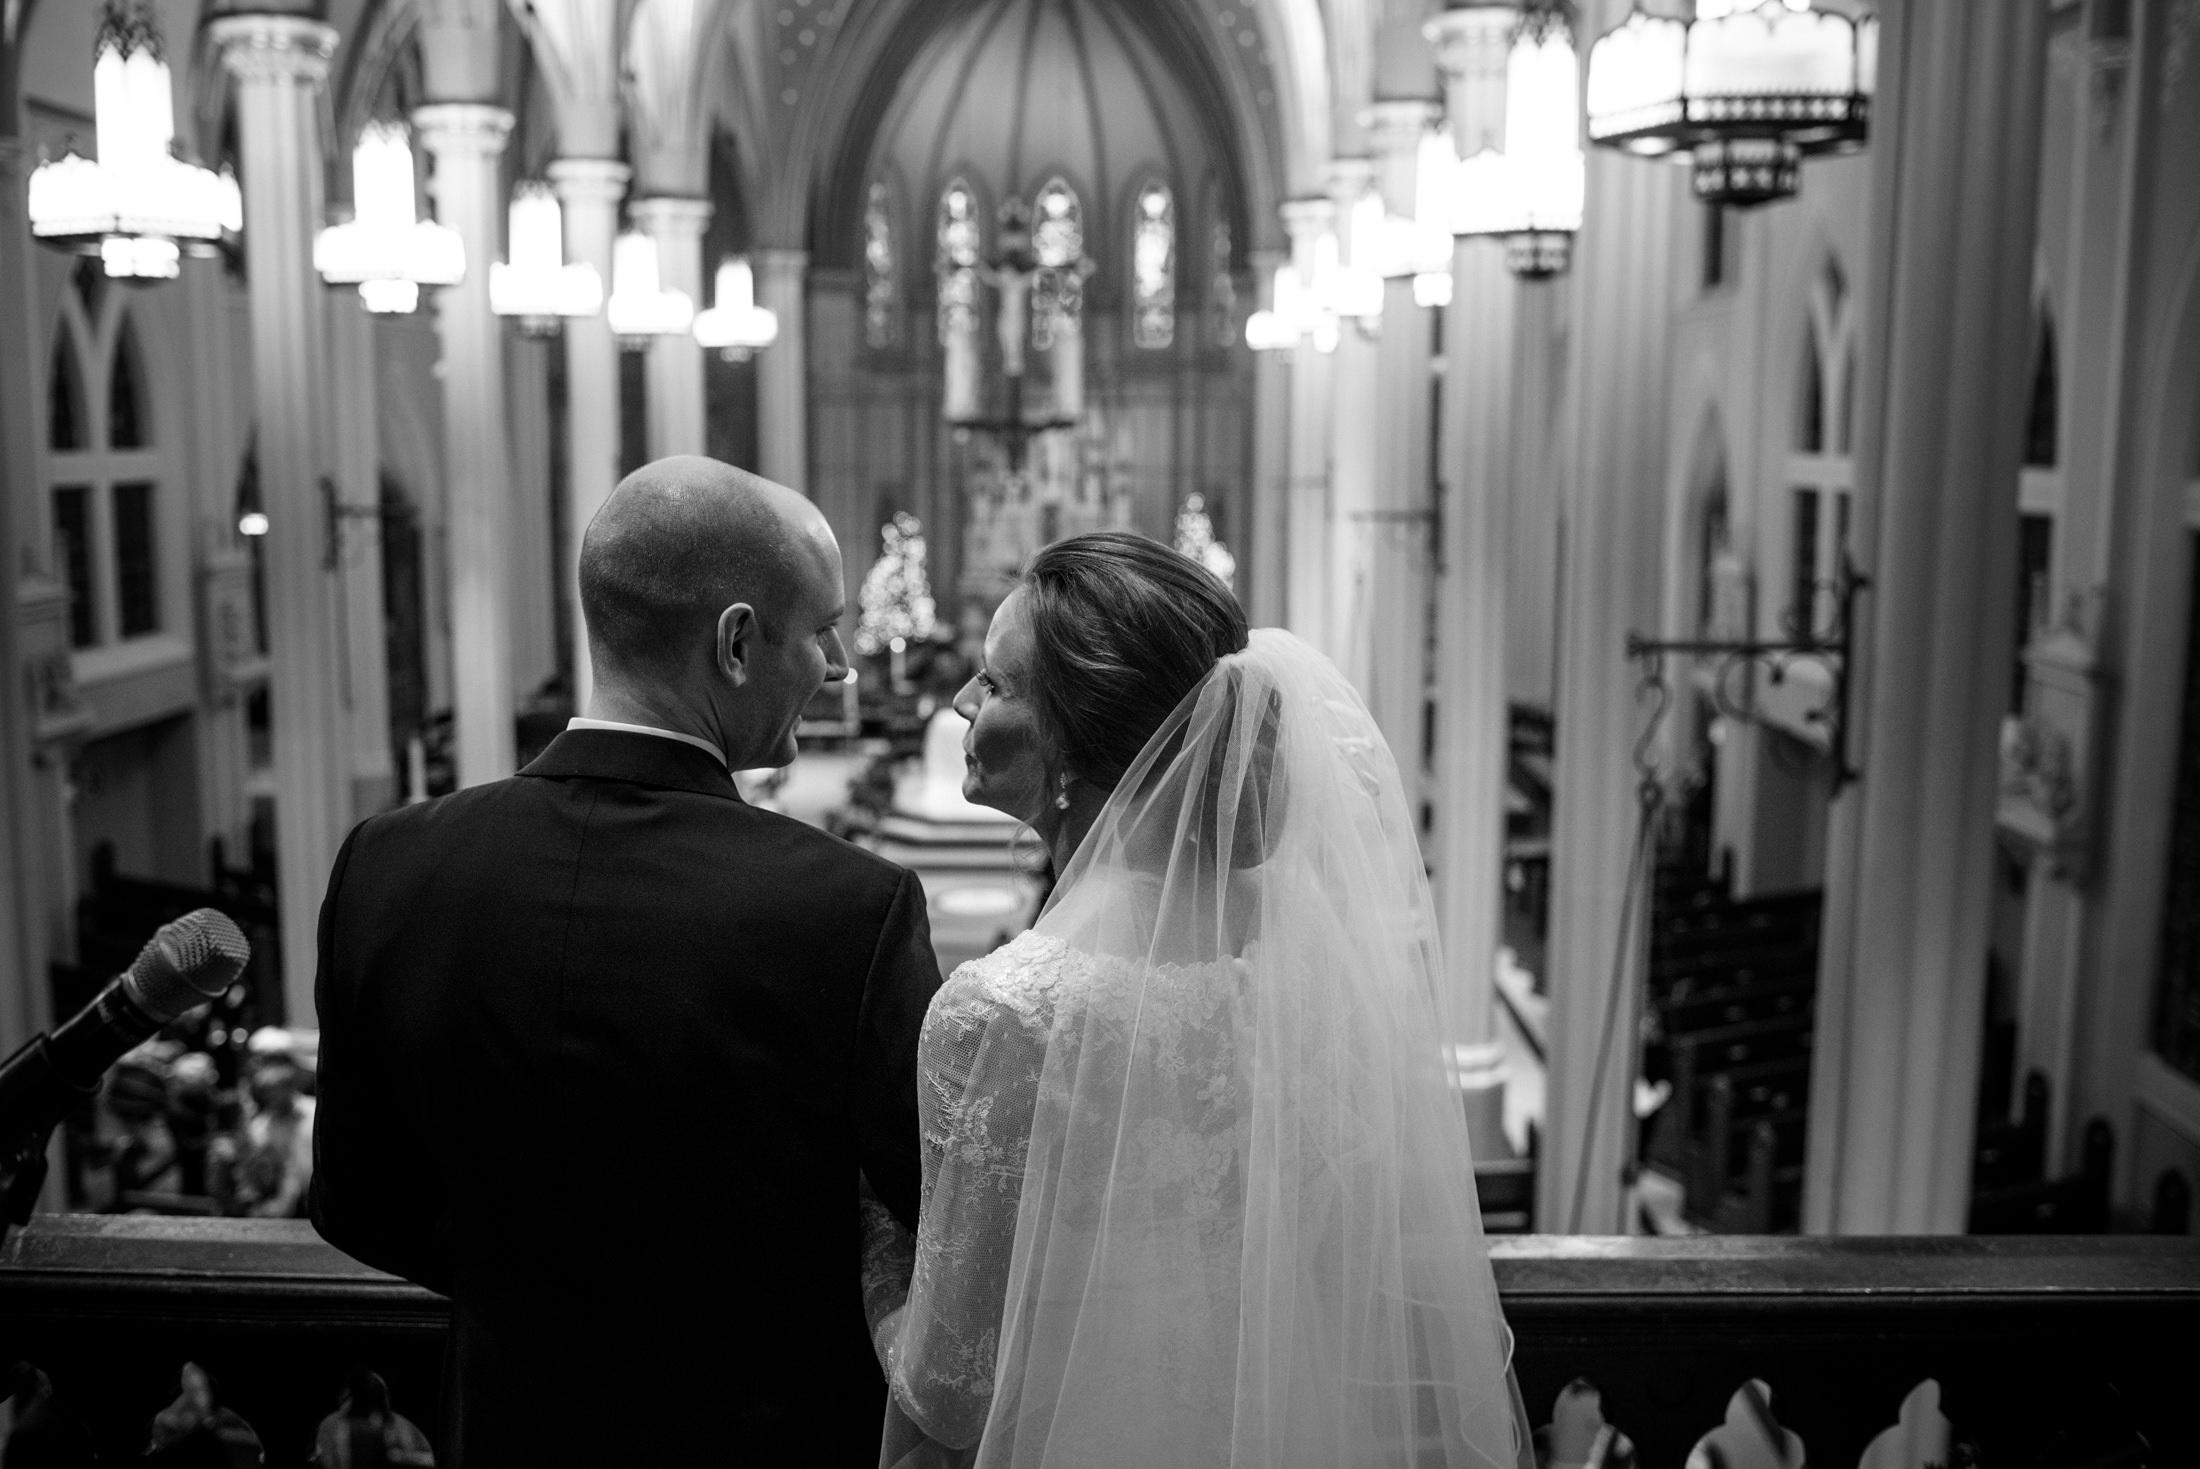 st-johns-creighton-omaha-wedding-photographer-jm-studios-0015.JPG